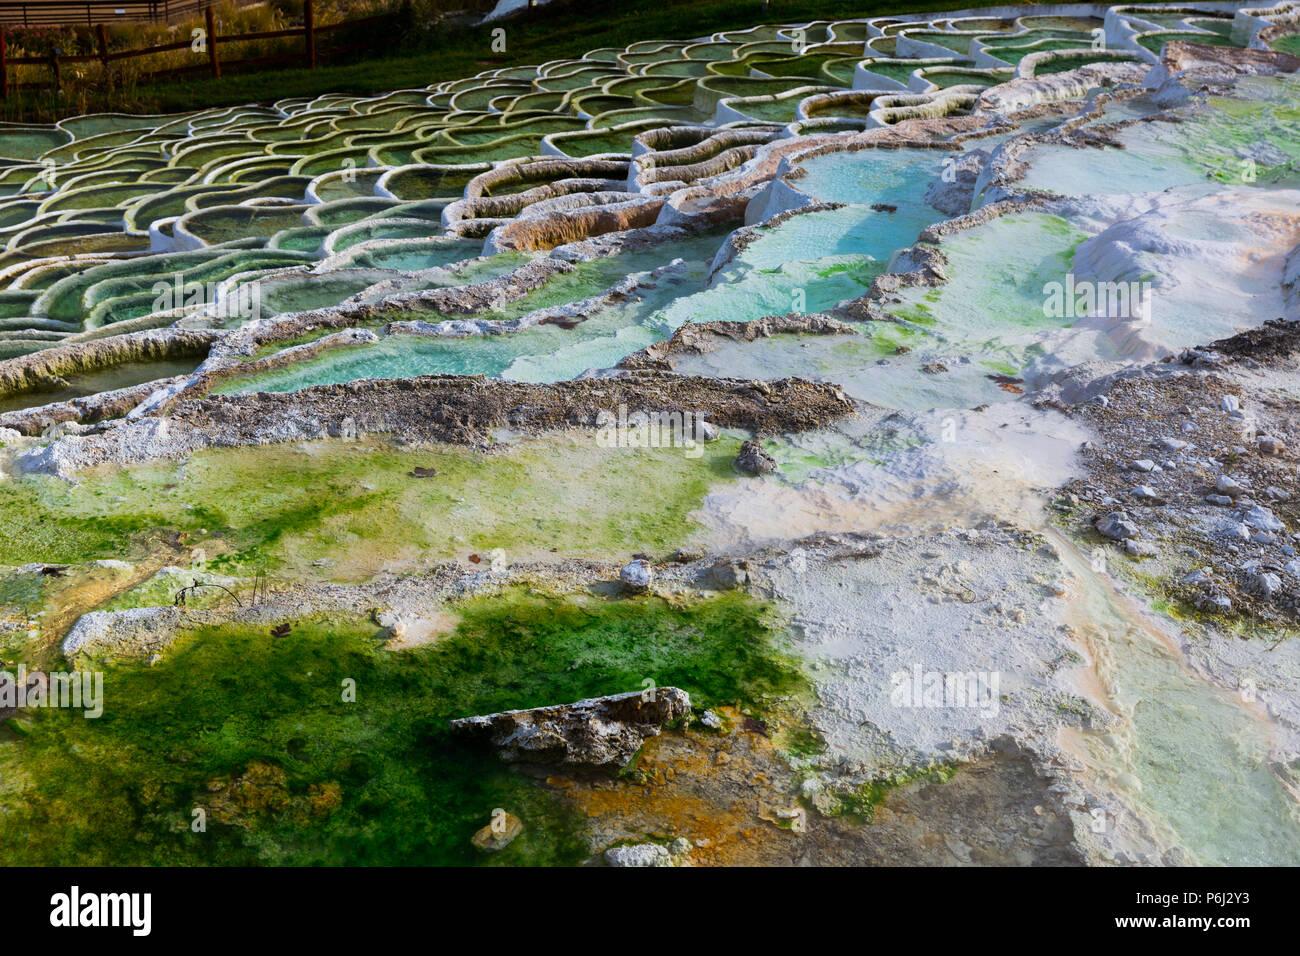 Terrazas Naturales Cuencas En Egerszalok Manantial Termal